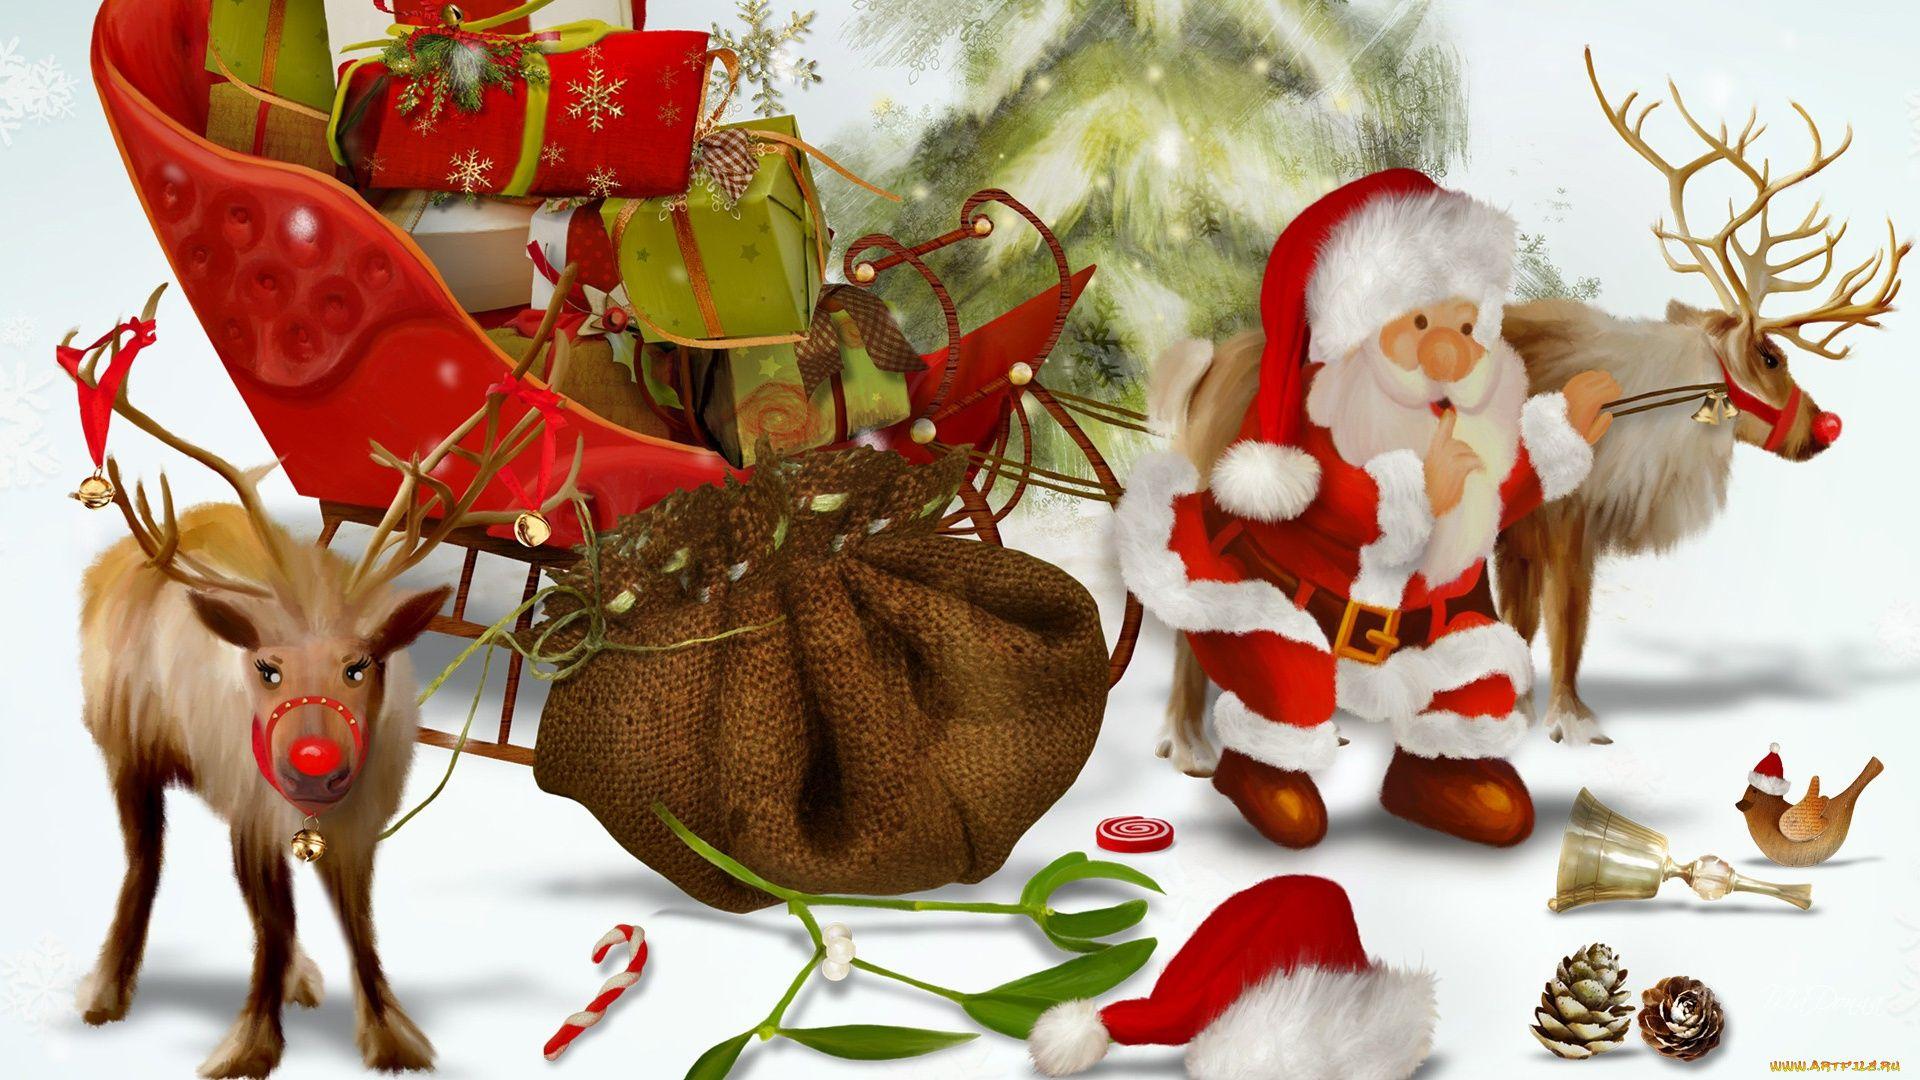 Christmas Sleigh wallpaper photo full hd